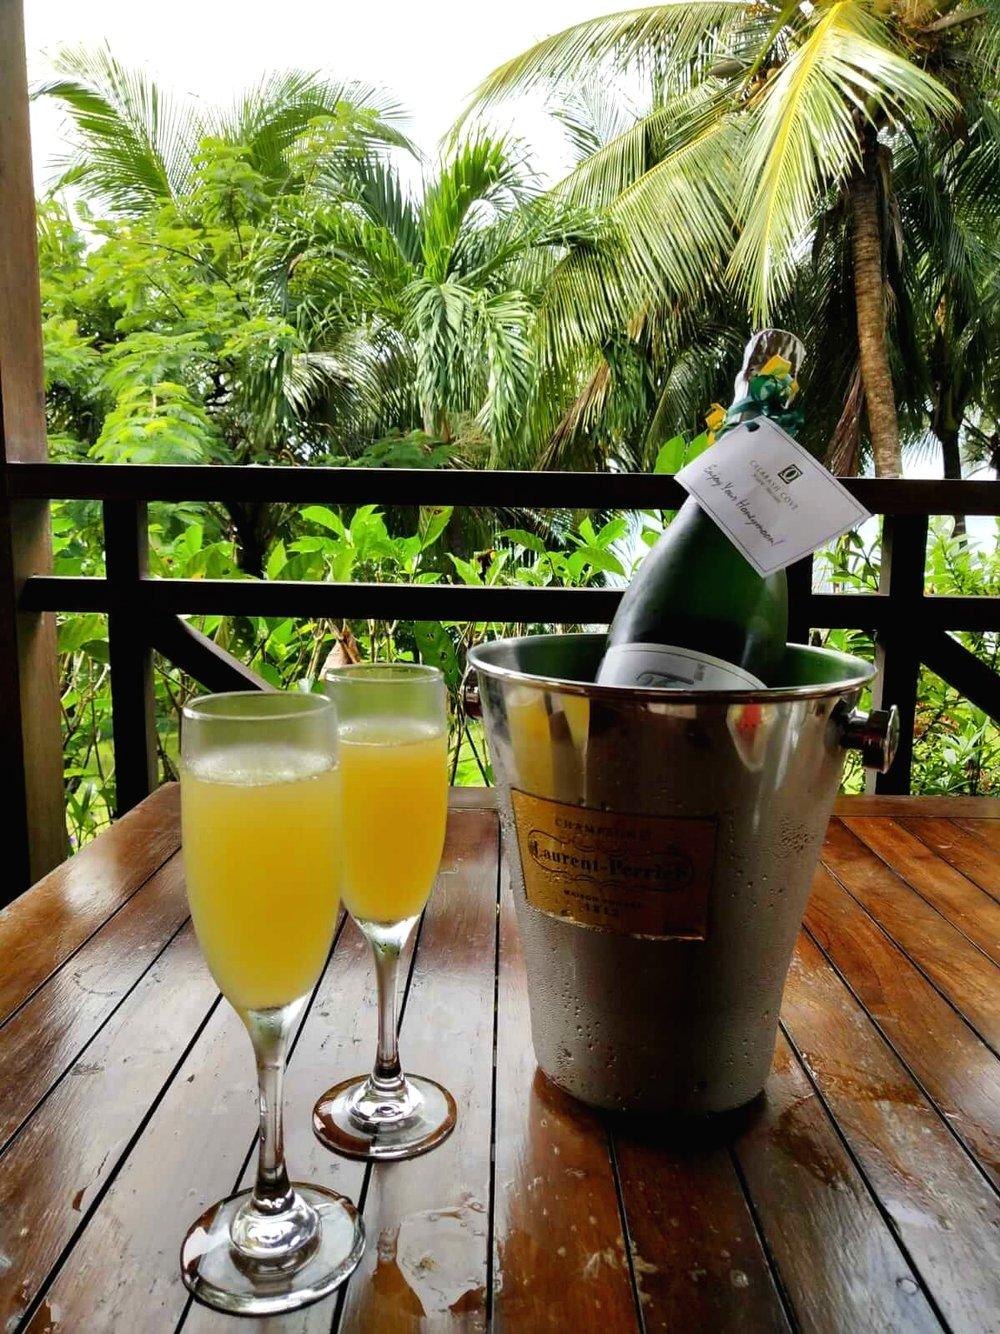 Calabash+Cove+St+Lucia+champagne